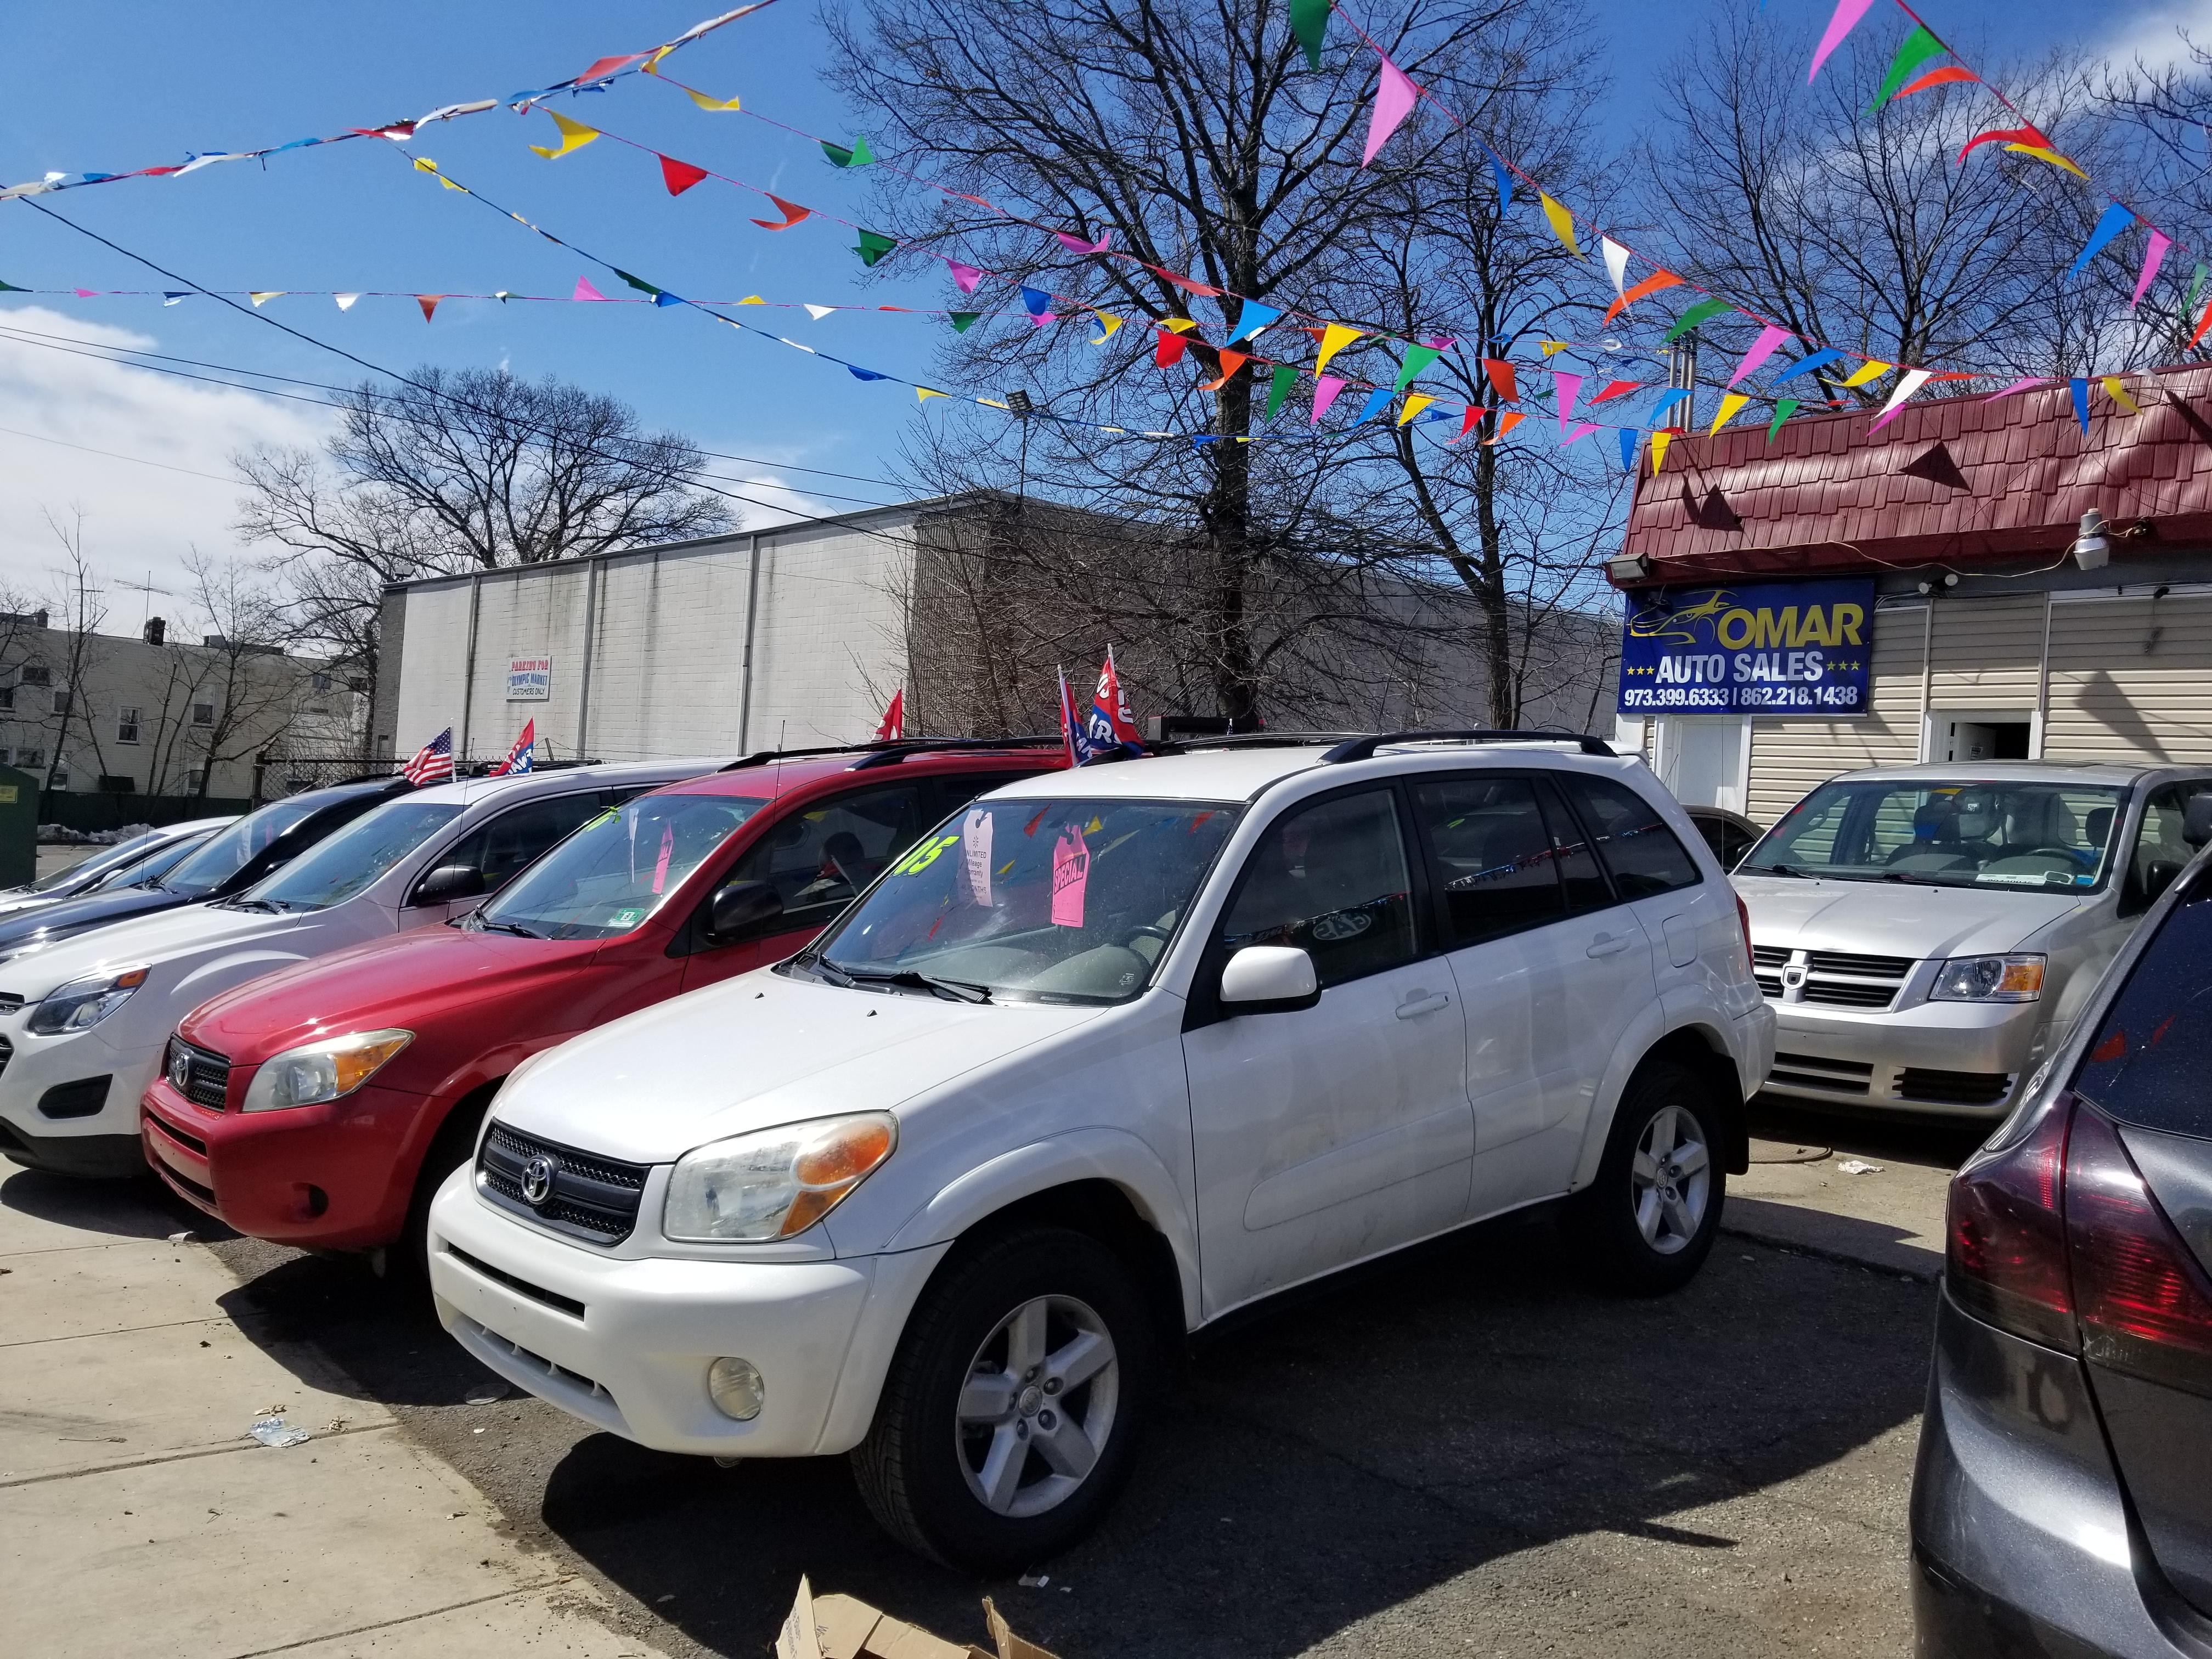 Omar Auto Sales 960 Chancellor Ave, Irvington, NJ 07111 ...